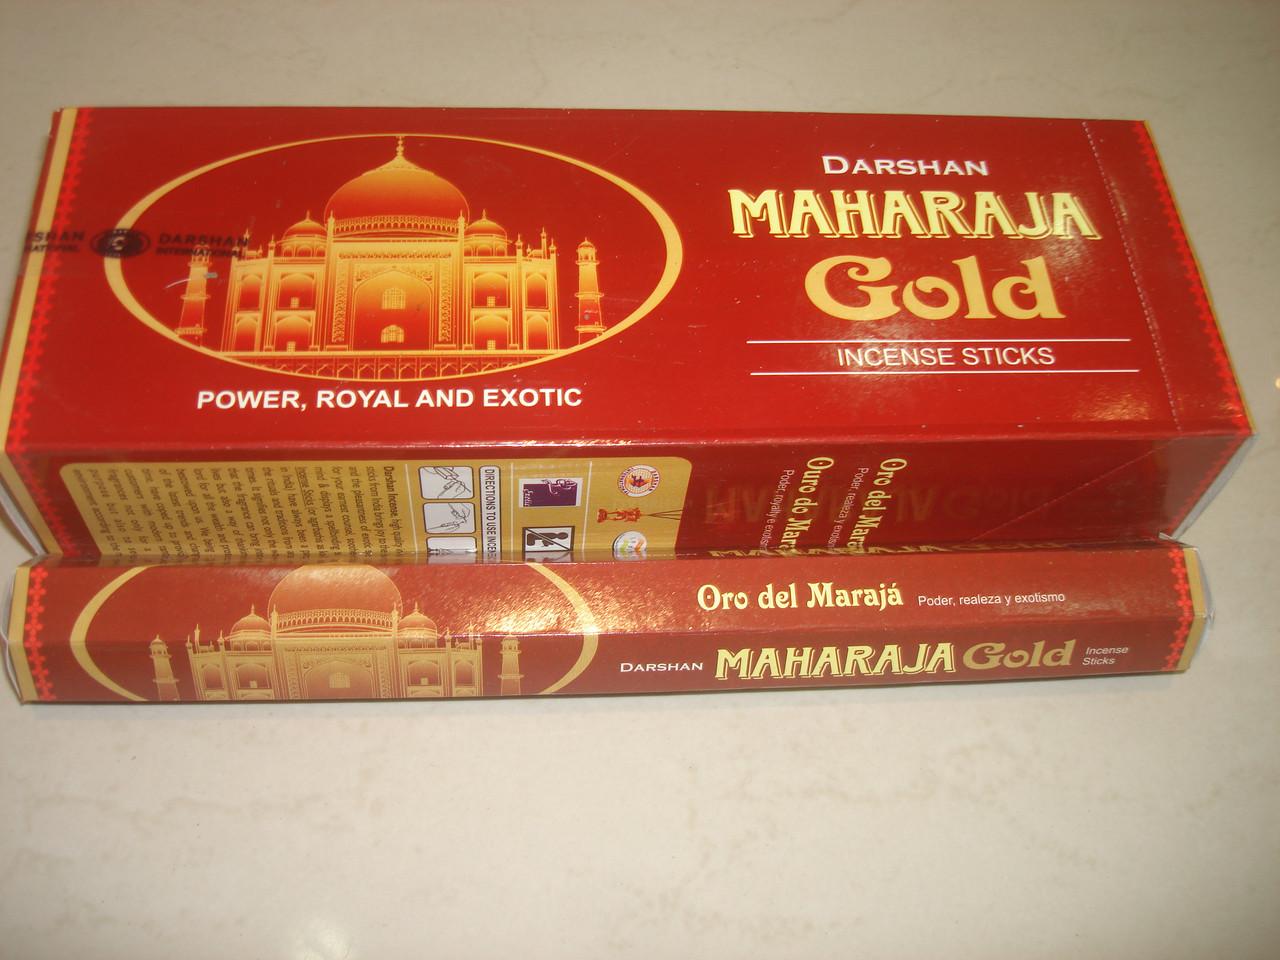 Maharaja Gold Darshan